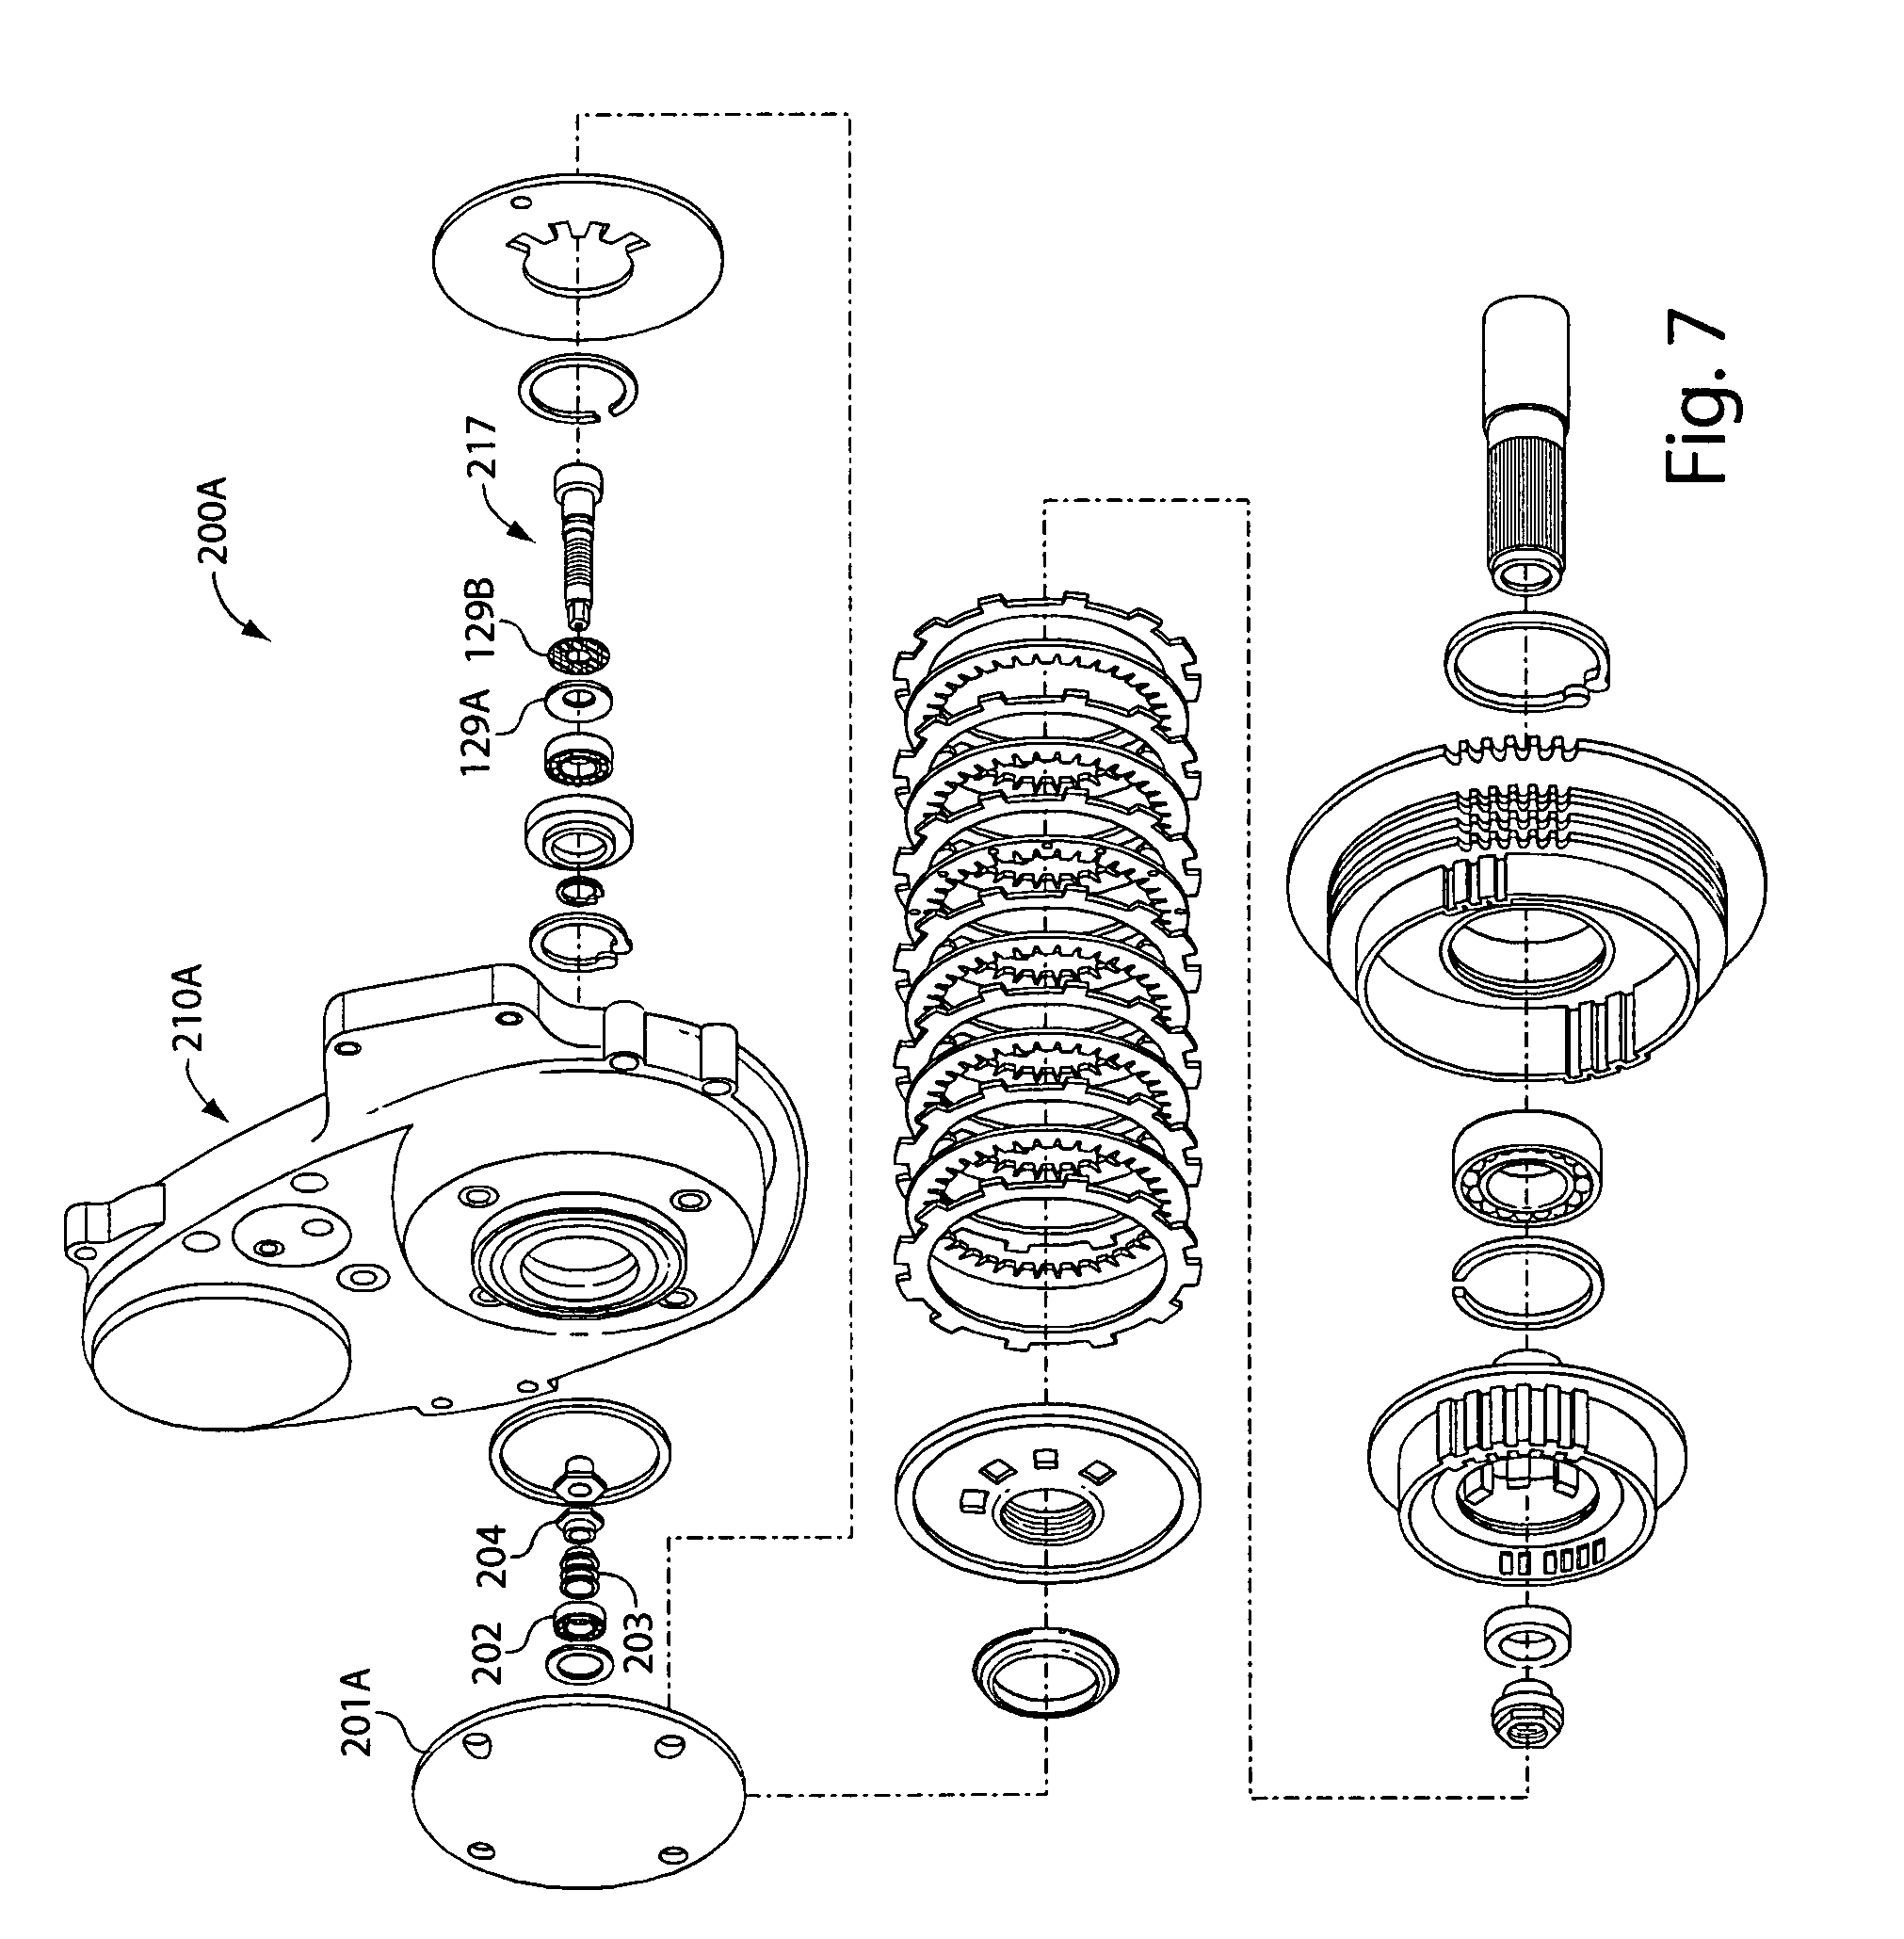 92 Harley Davidson Sportster Parts Diagram. Diagram. Auto